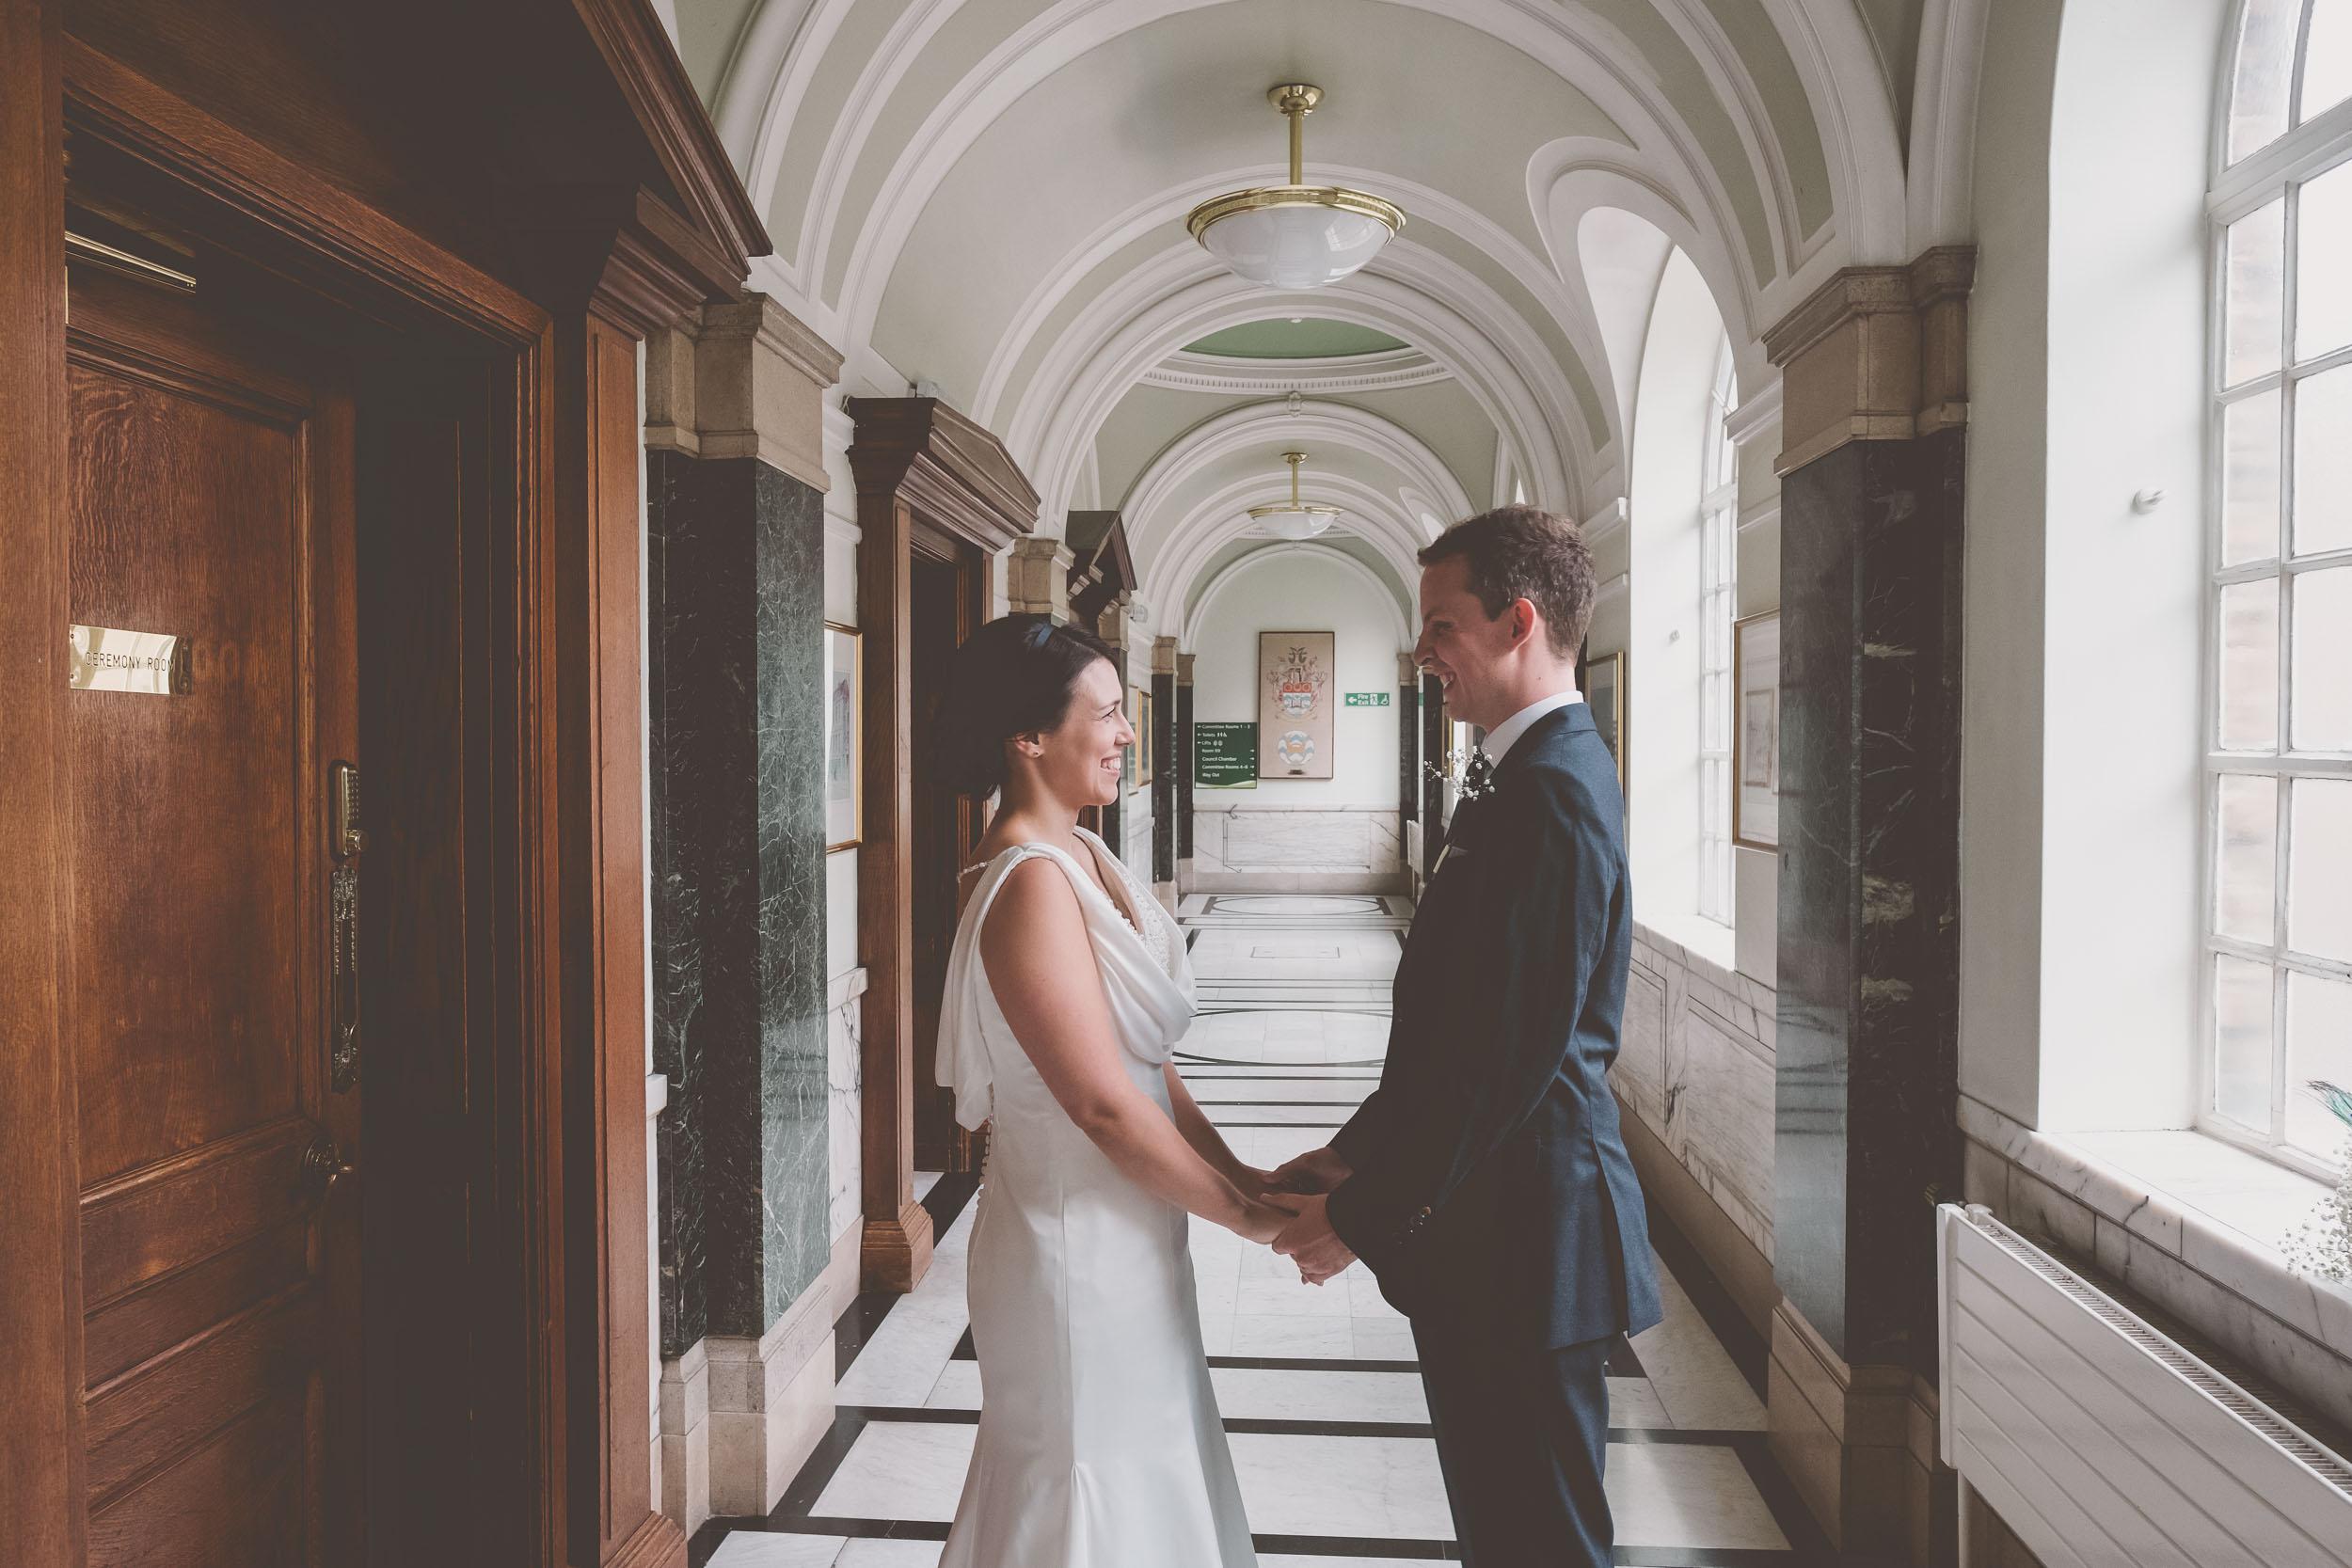 islington-town-hall-4th-floor-studios-wedding130.jpg